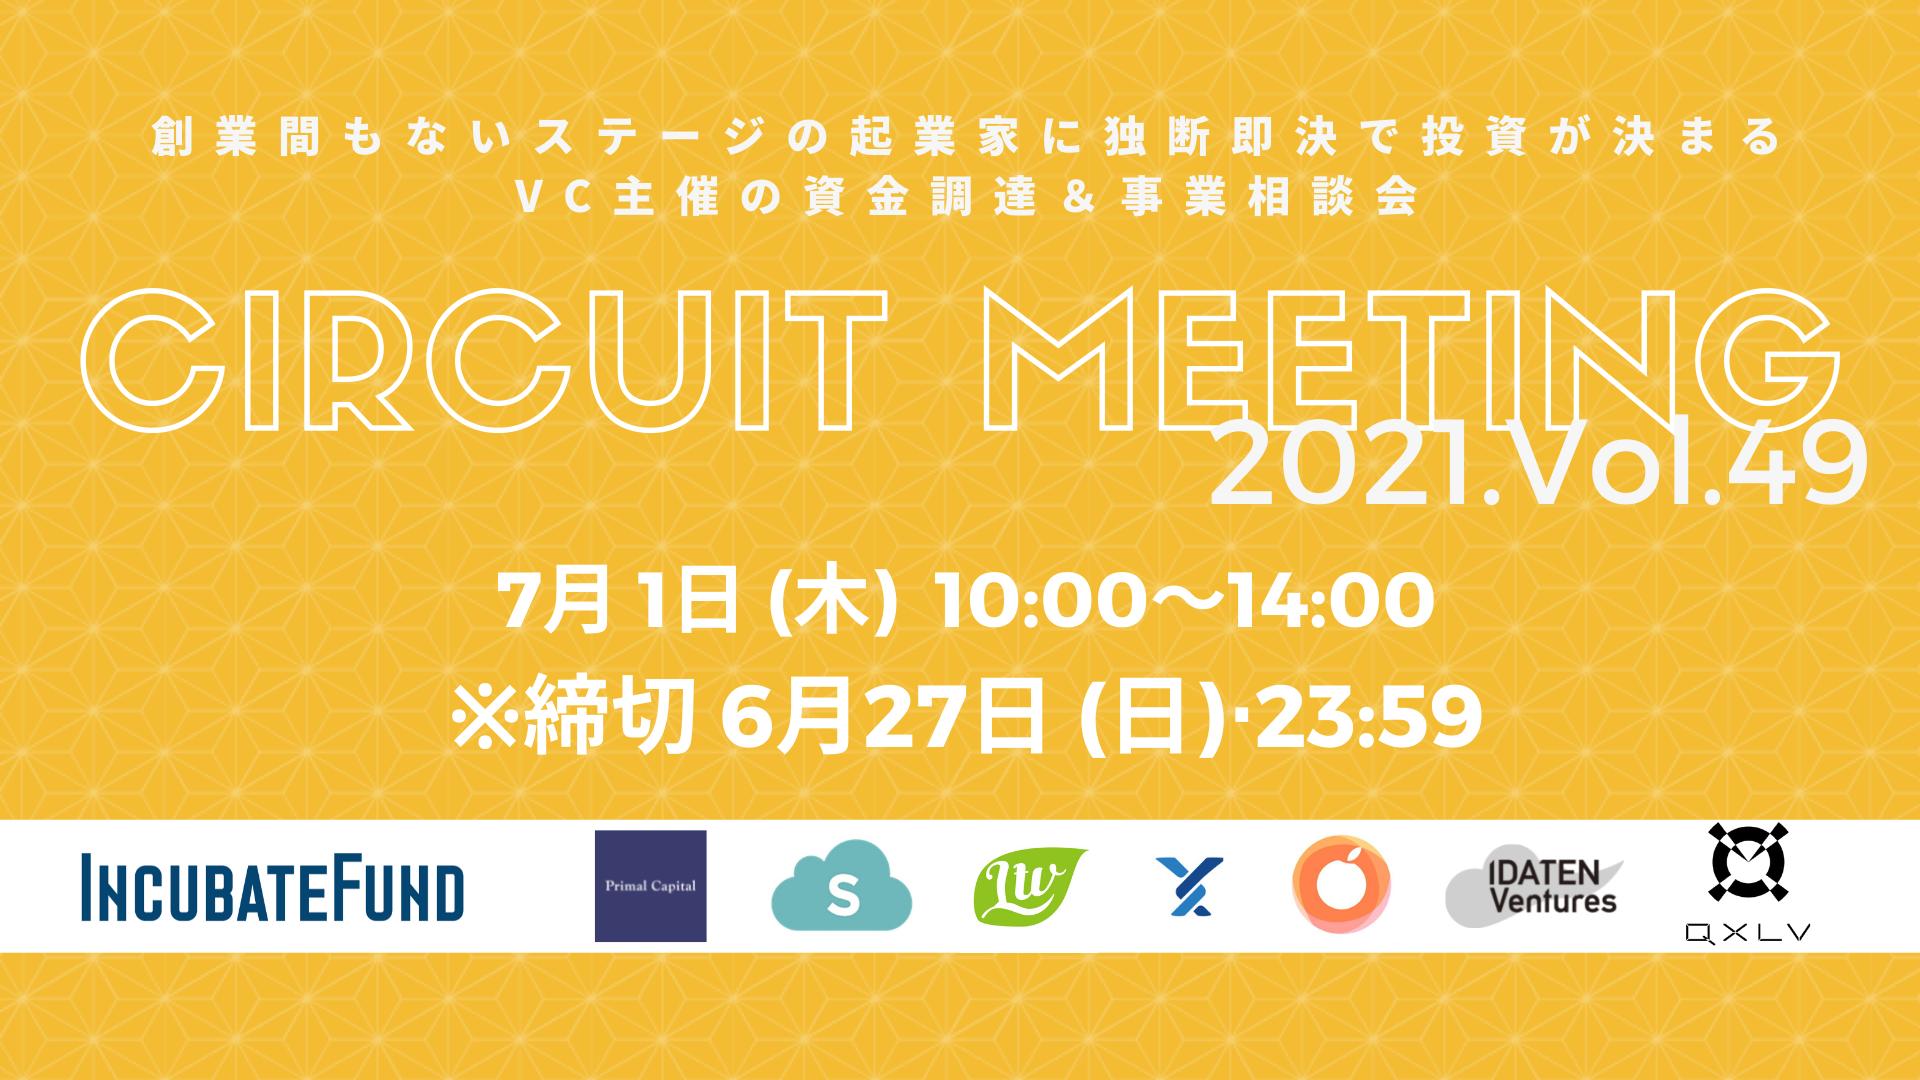 【6/26締切】Circuit Meeting Vol.49